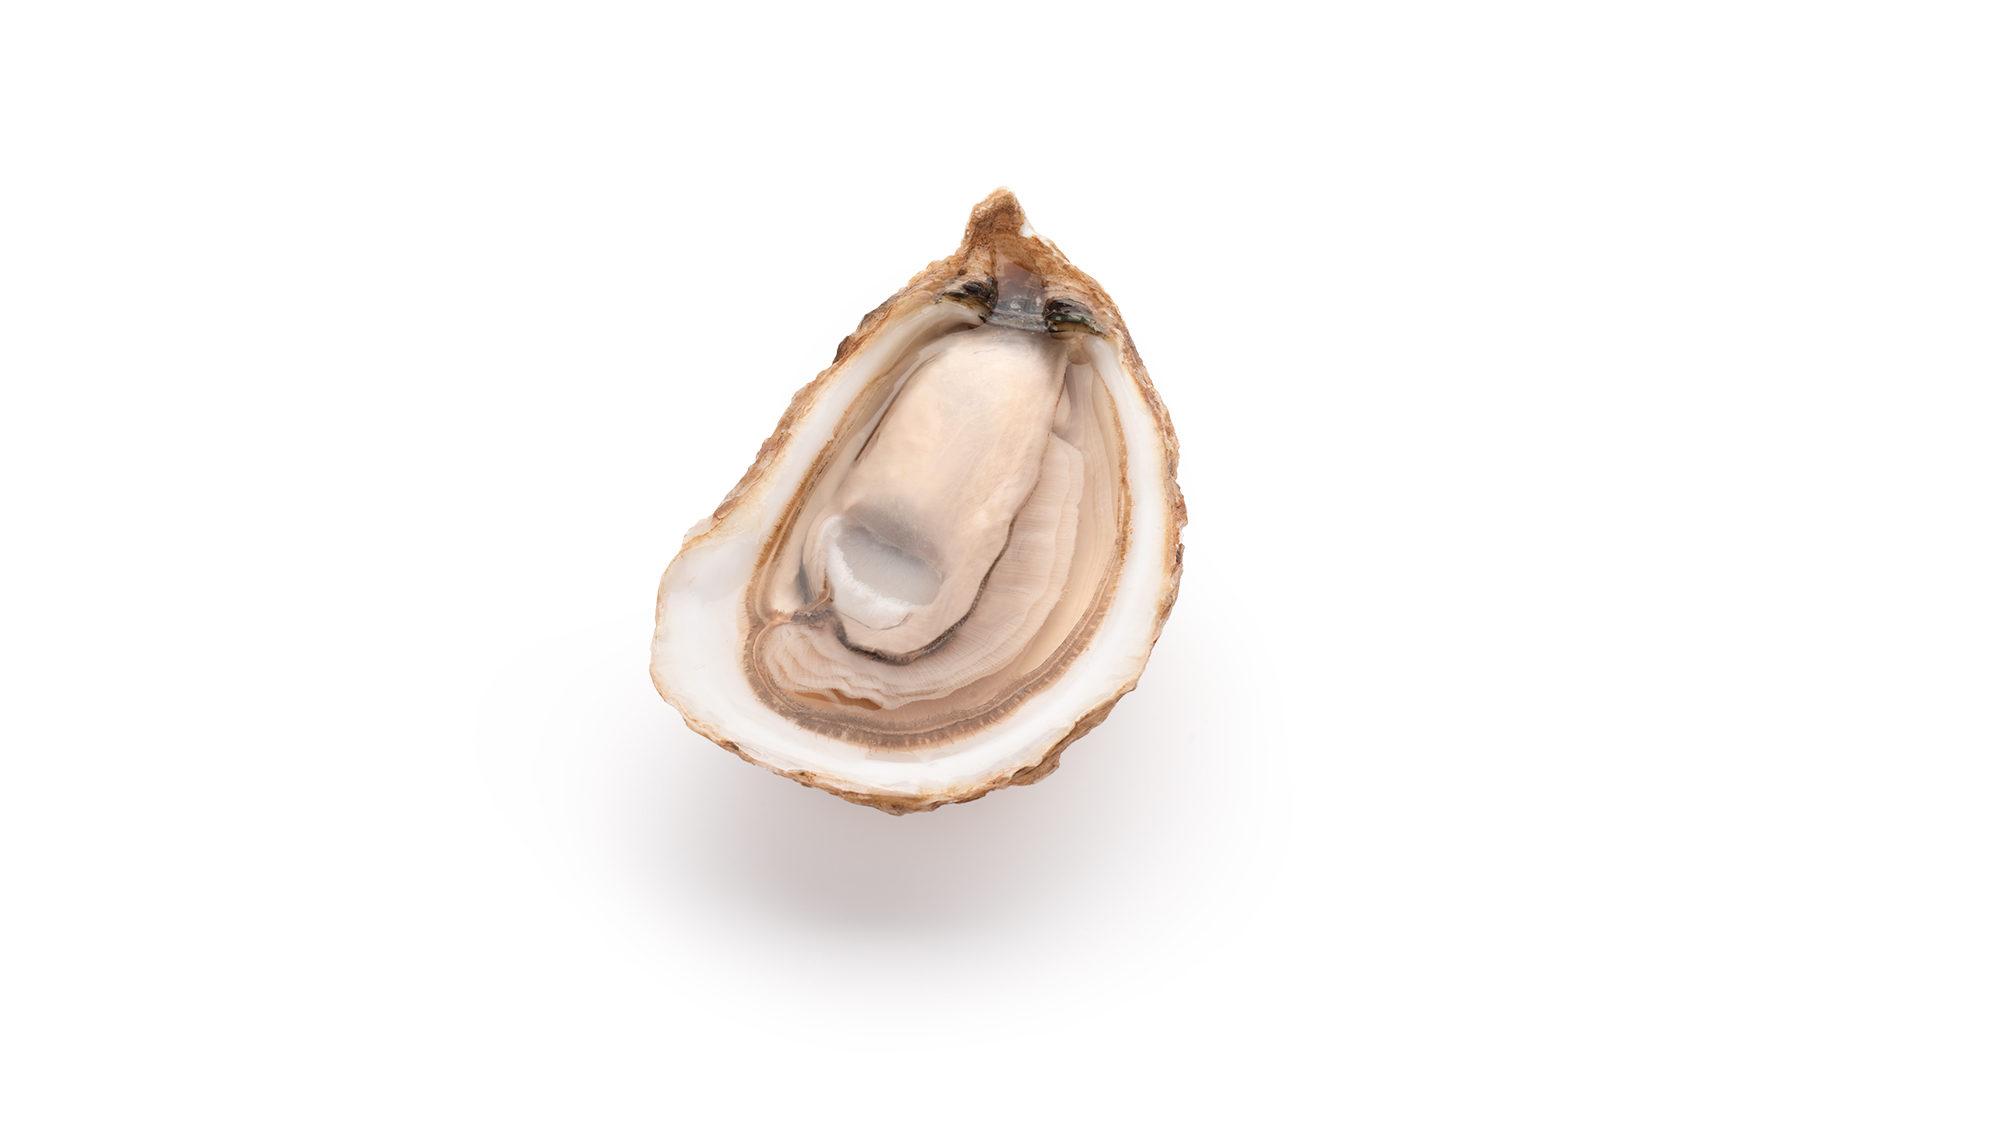 oyster-crassostrea-virginica-product